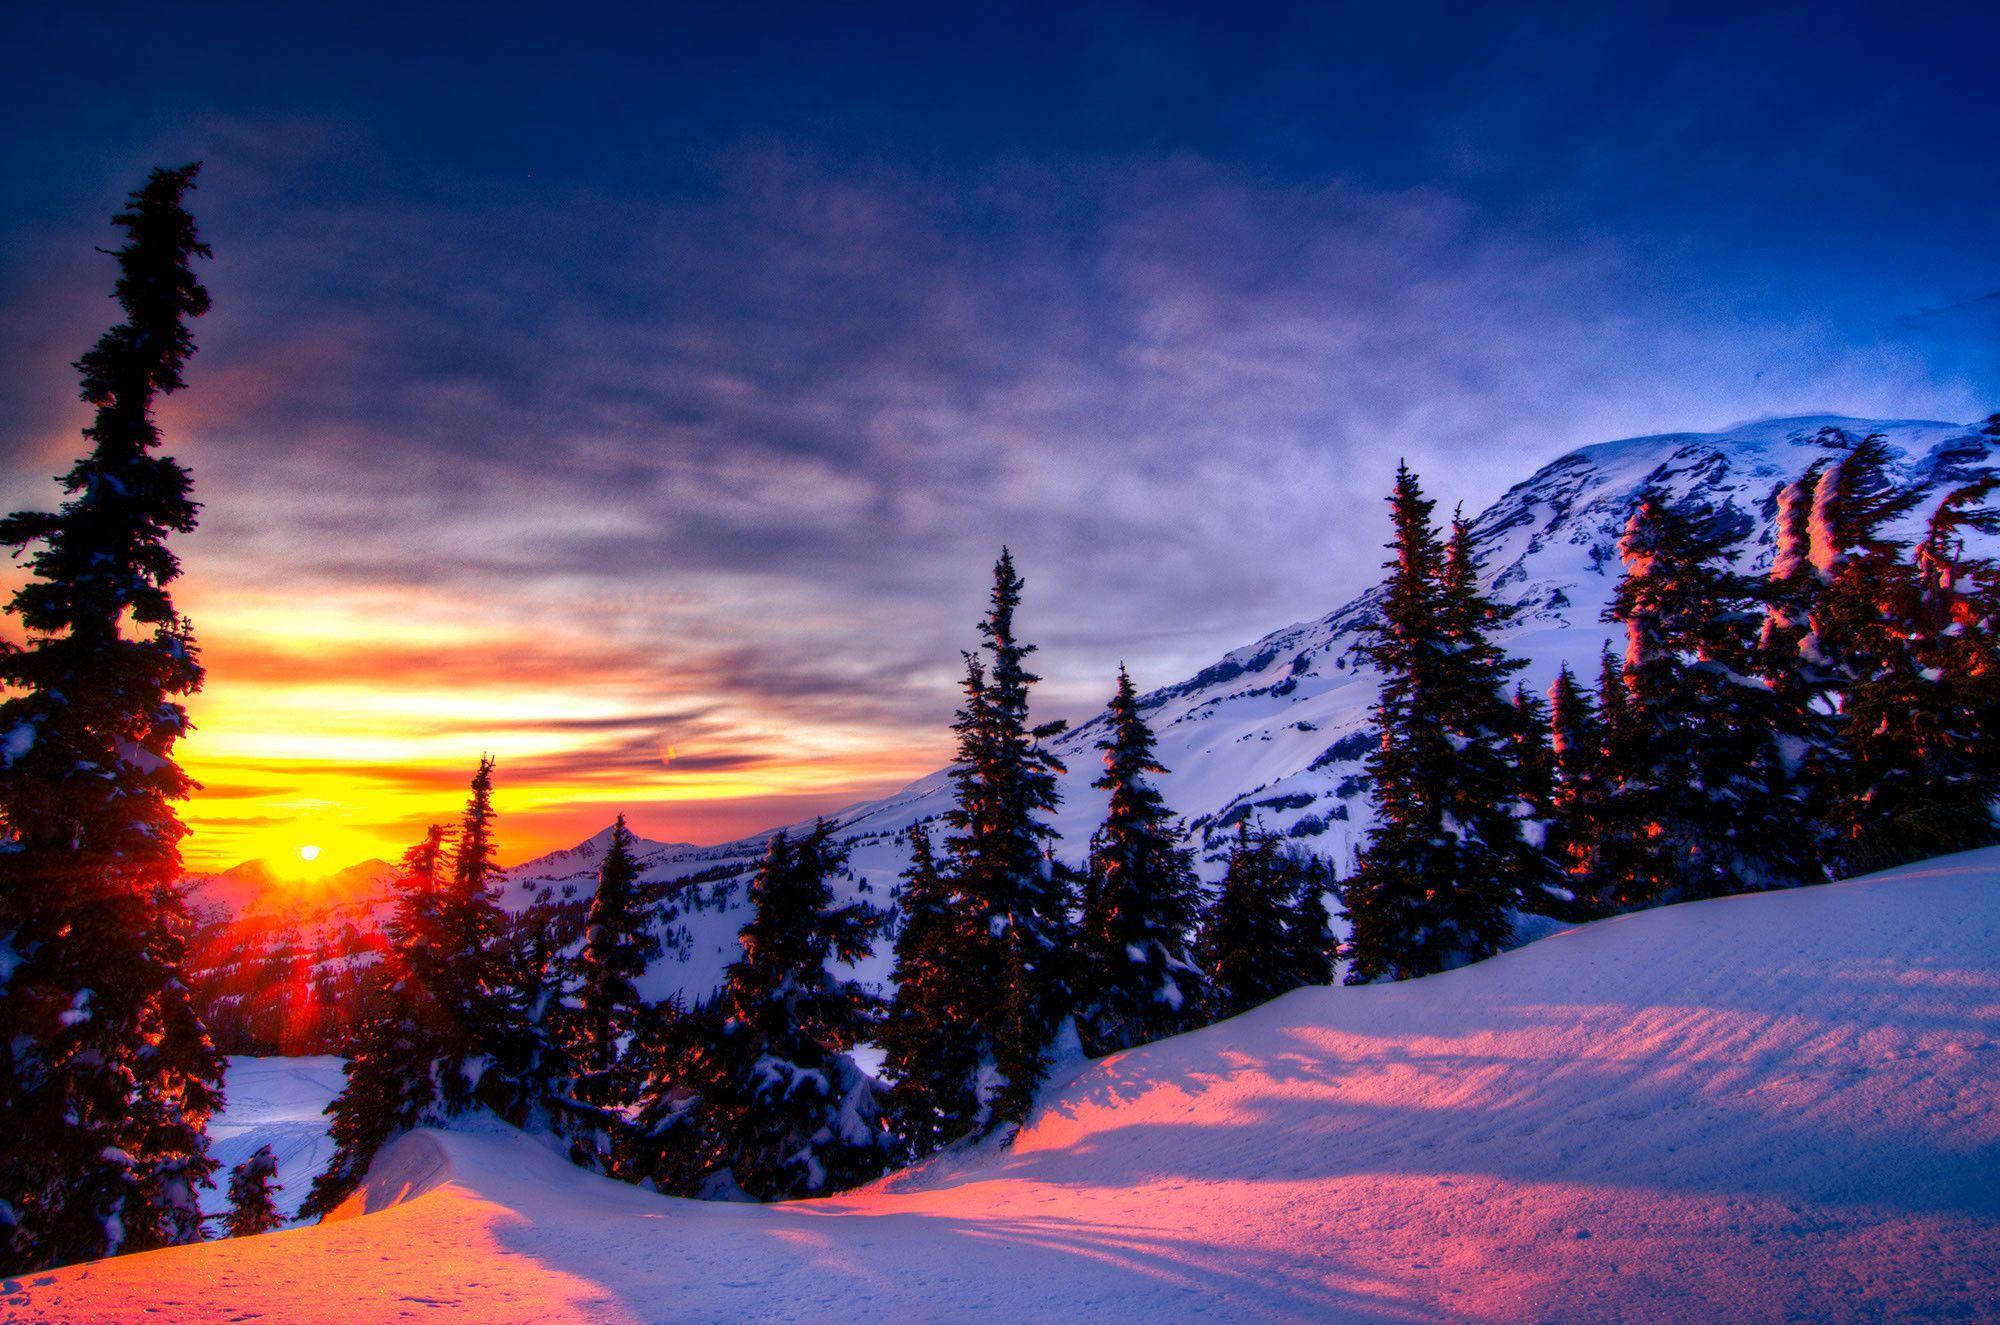 Colorado Snow Wallpapers Top Free Colorado Snow Backgrounds Wallpaperaccess